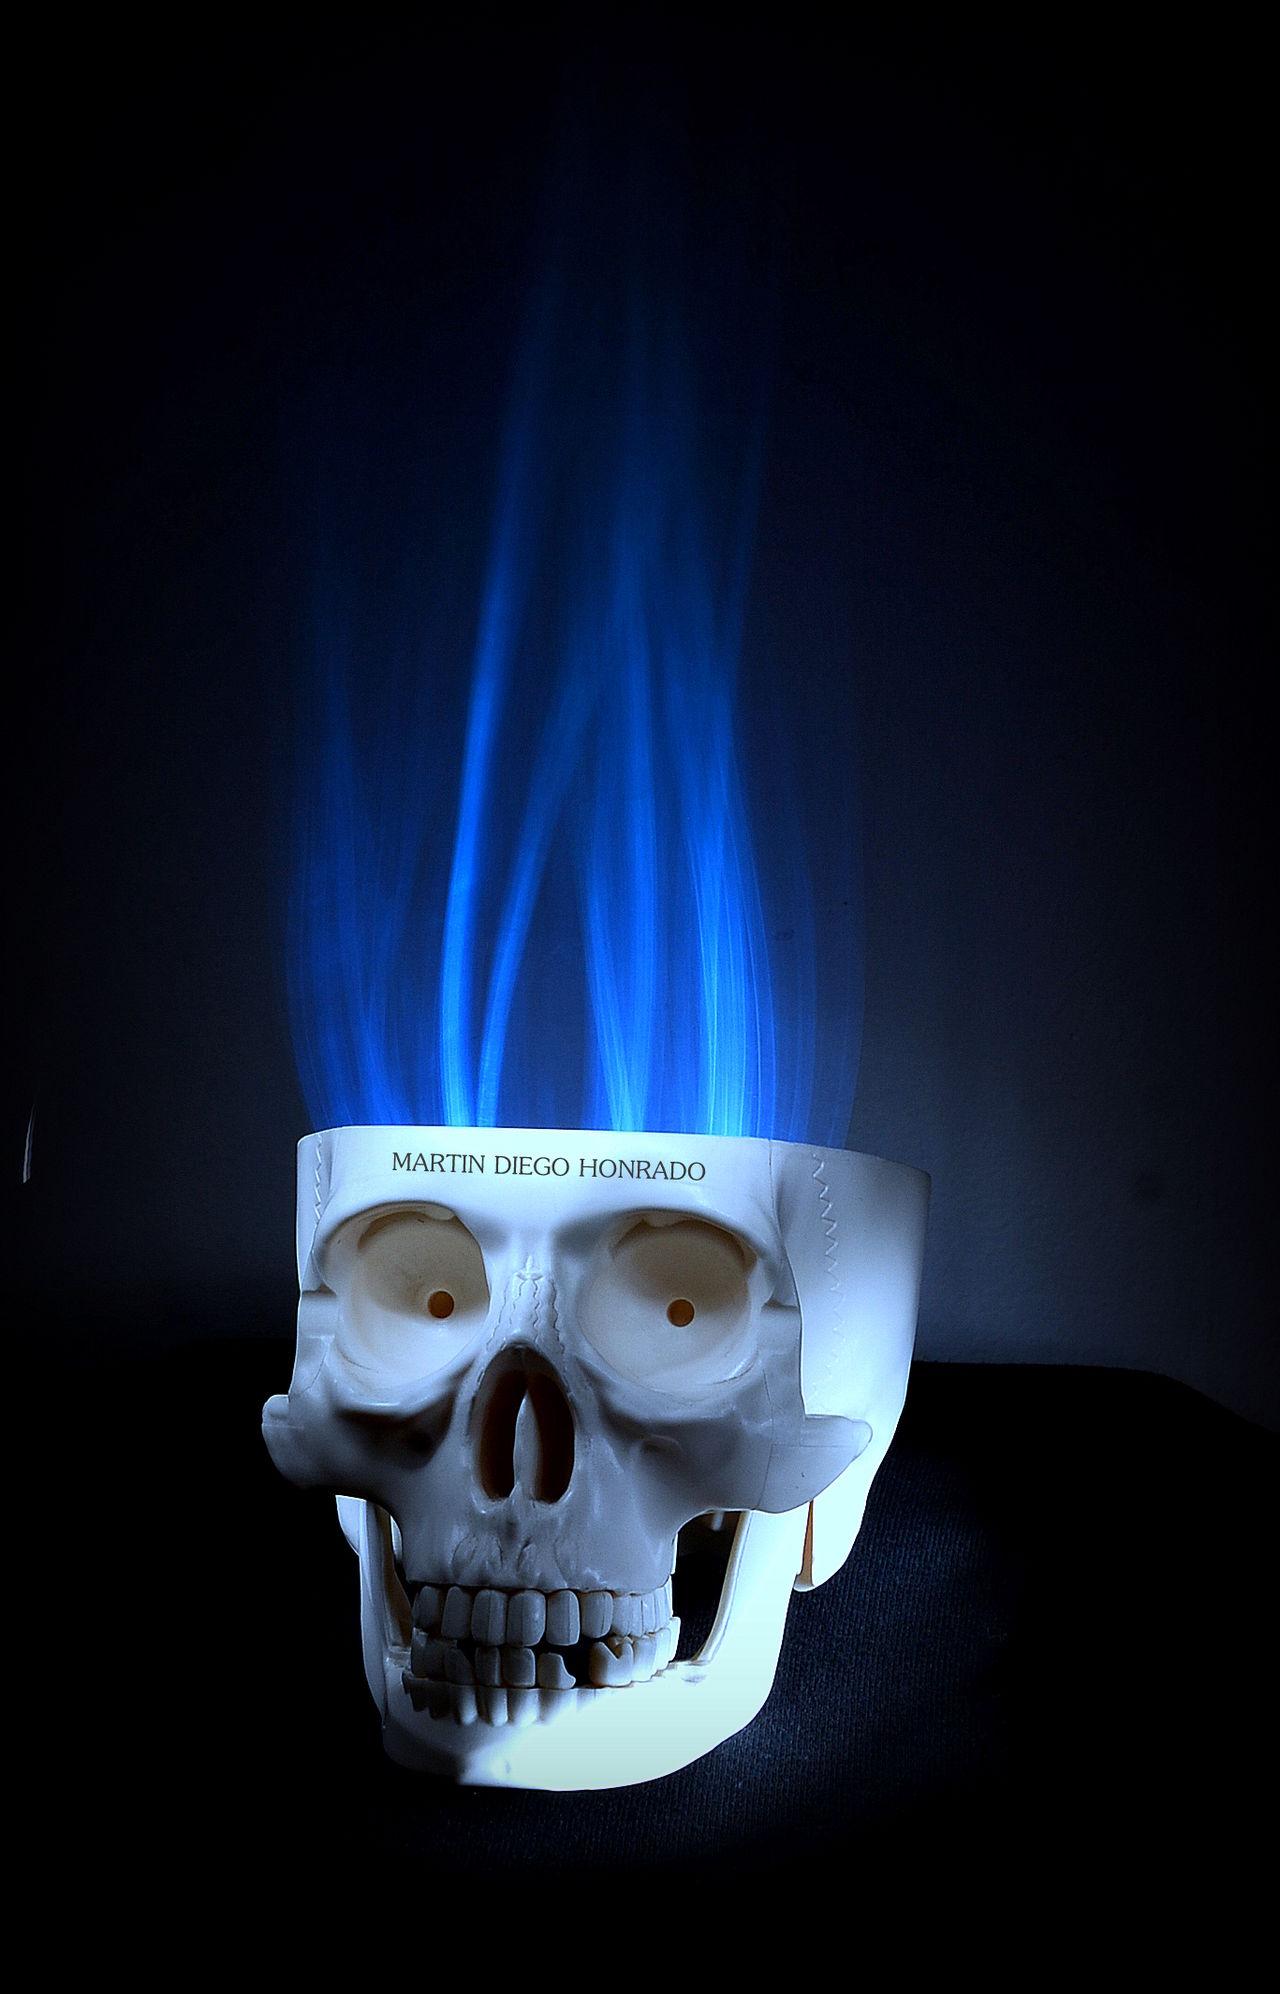 Skull Skull Art Flame Blue Flame Blue Flames Calavera  Lightpainting Lightpaintingphotography Jugando Con La Luz Lightpainting Photography Exposure Aperture Shutterspeed